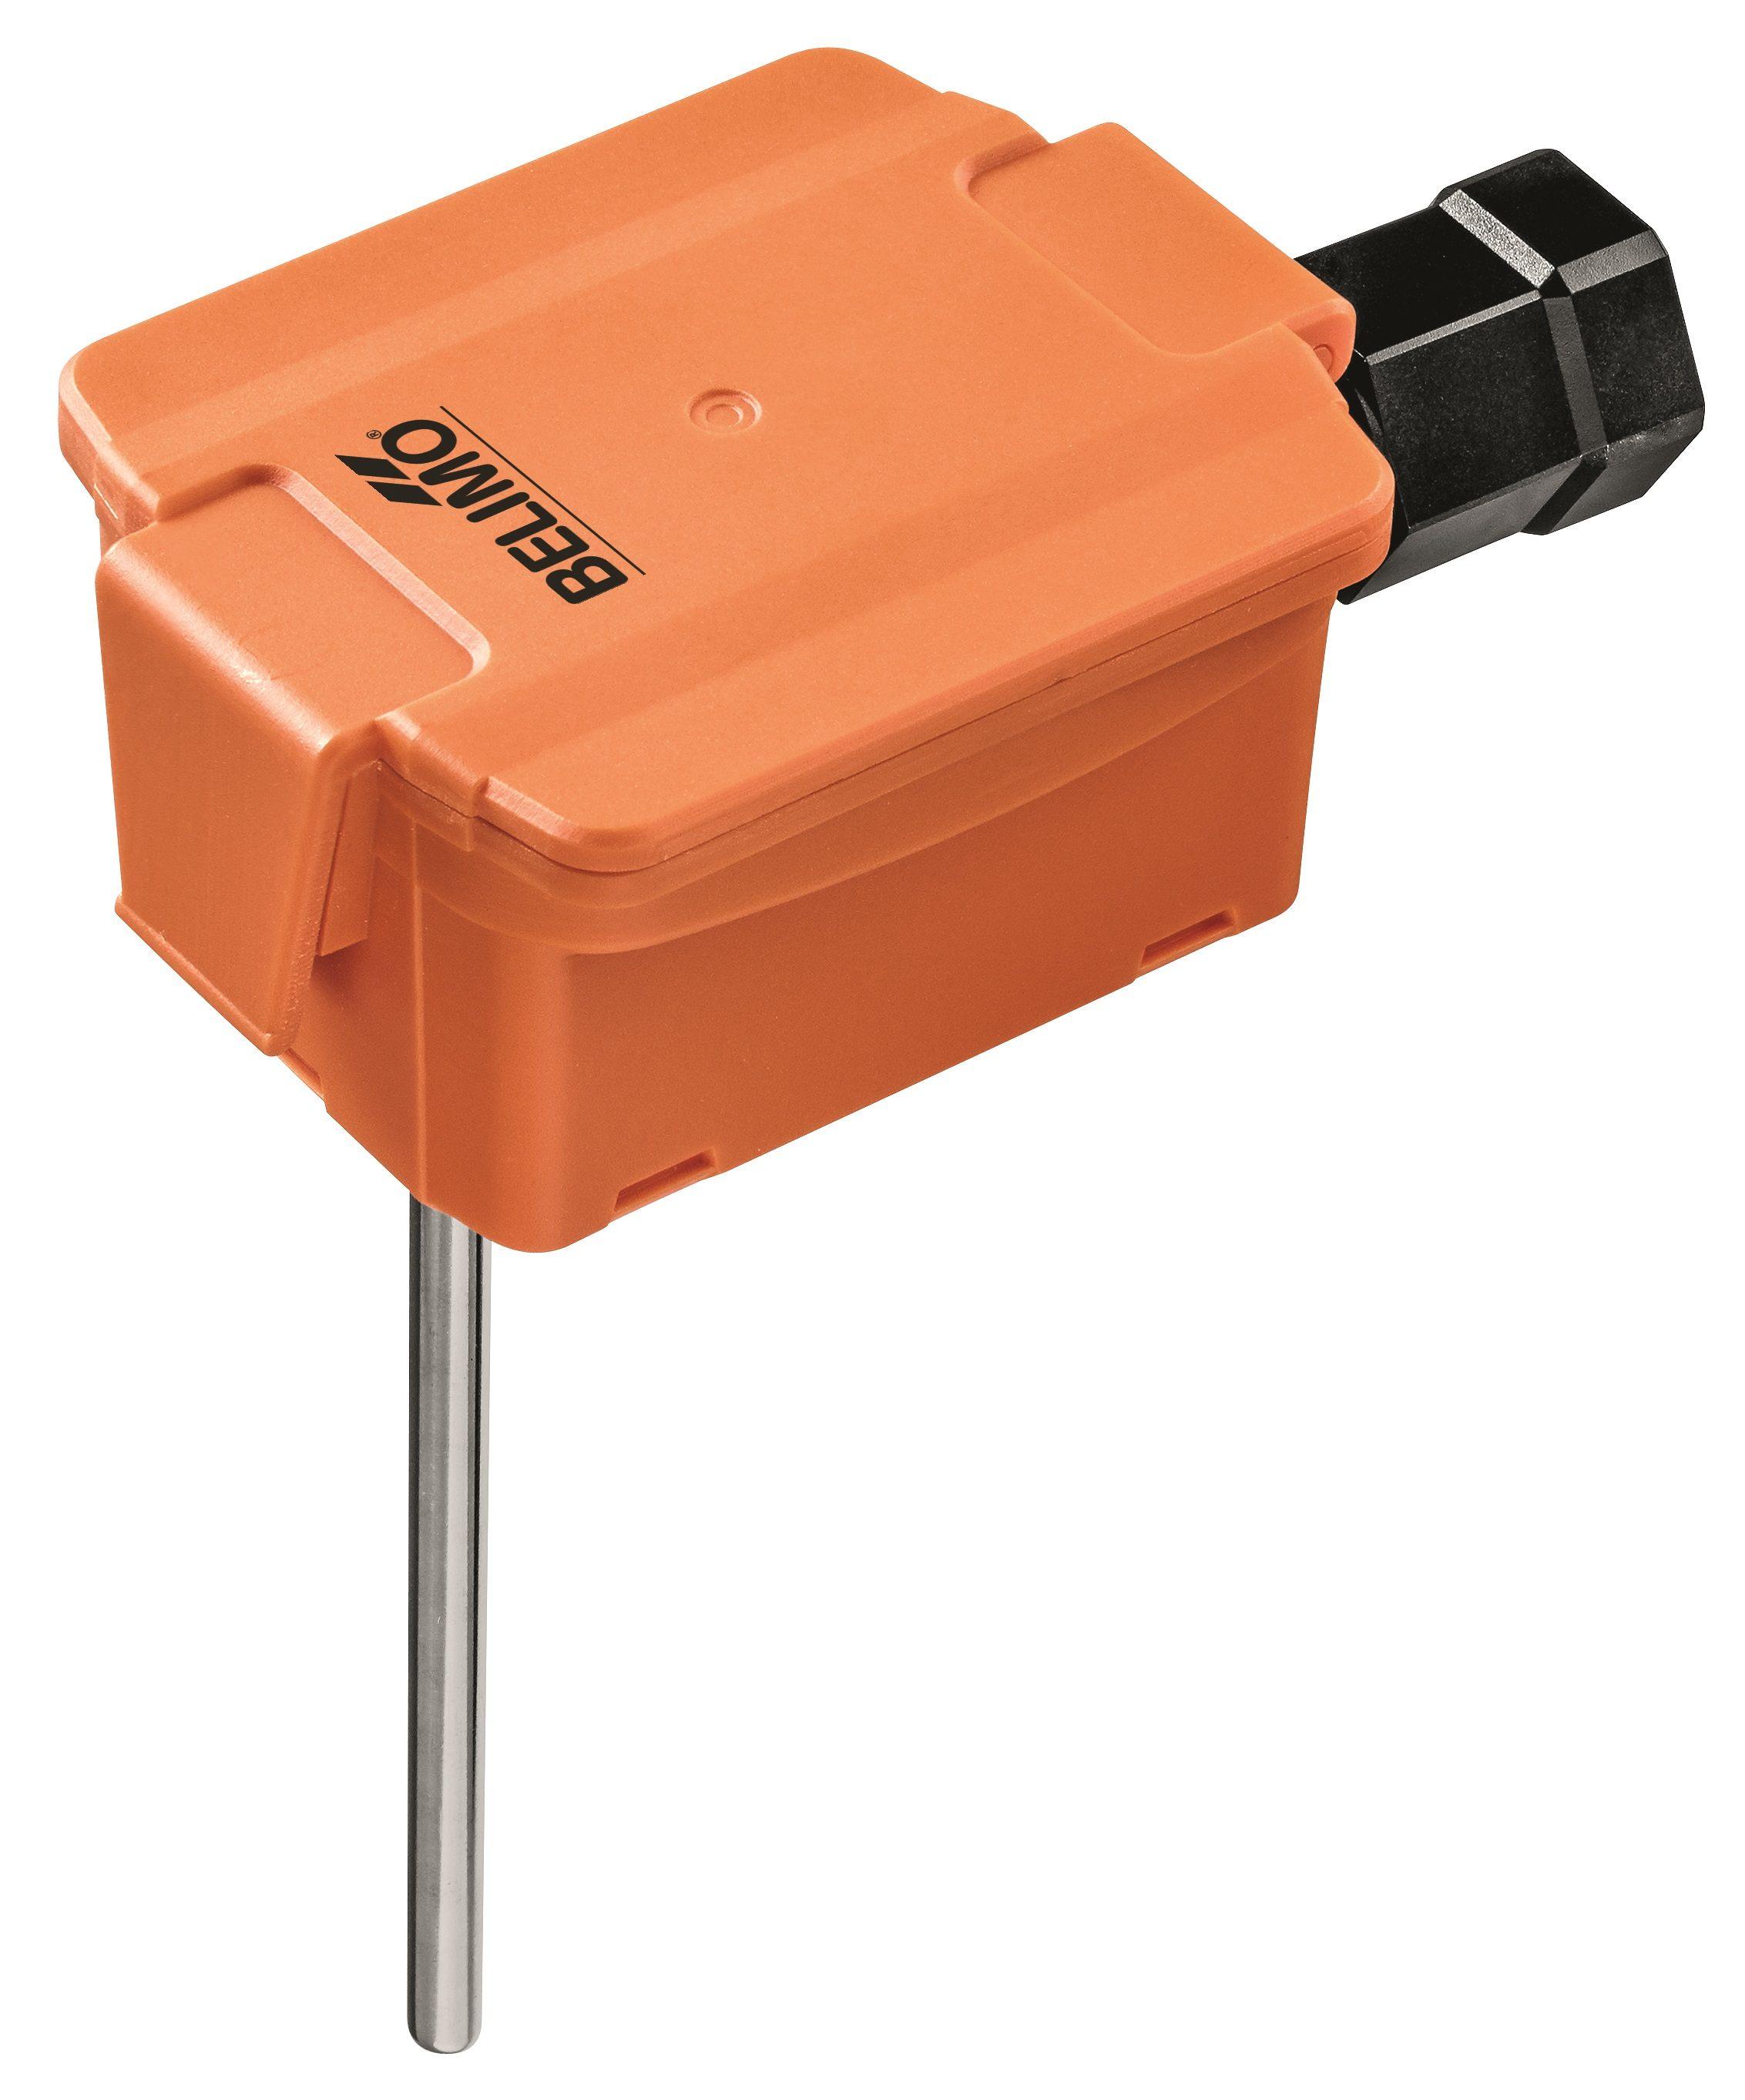 Belimo Belimo HVAC Sensors (2017) 01DT-5BT Sensors